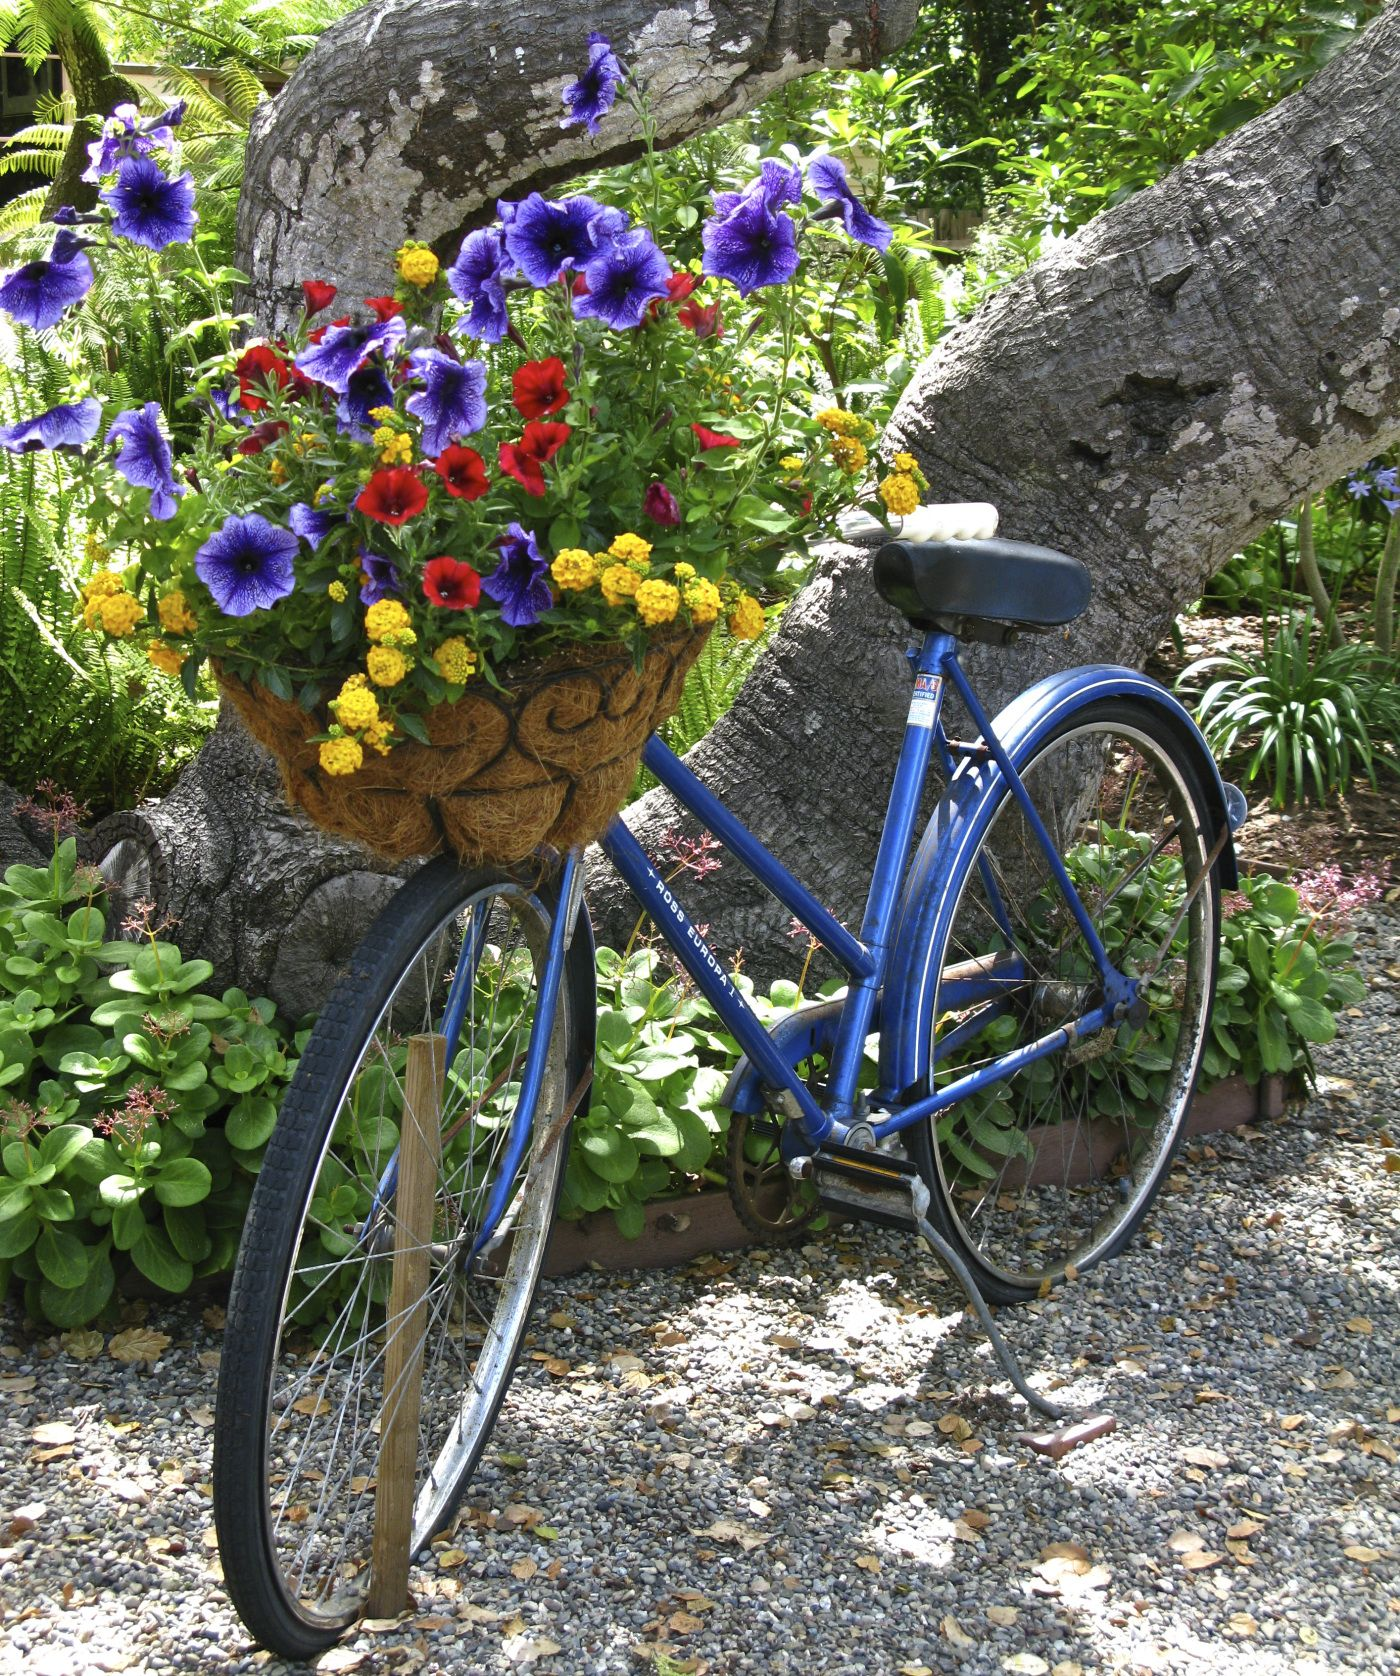 Uncategorized Bicycle Planters bike planter garden bicycle planters pinterest gardens planter